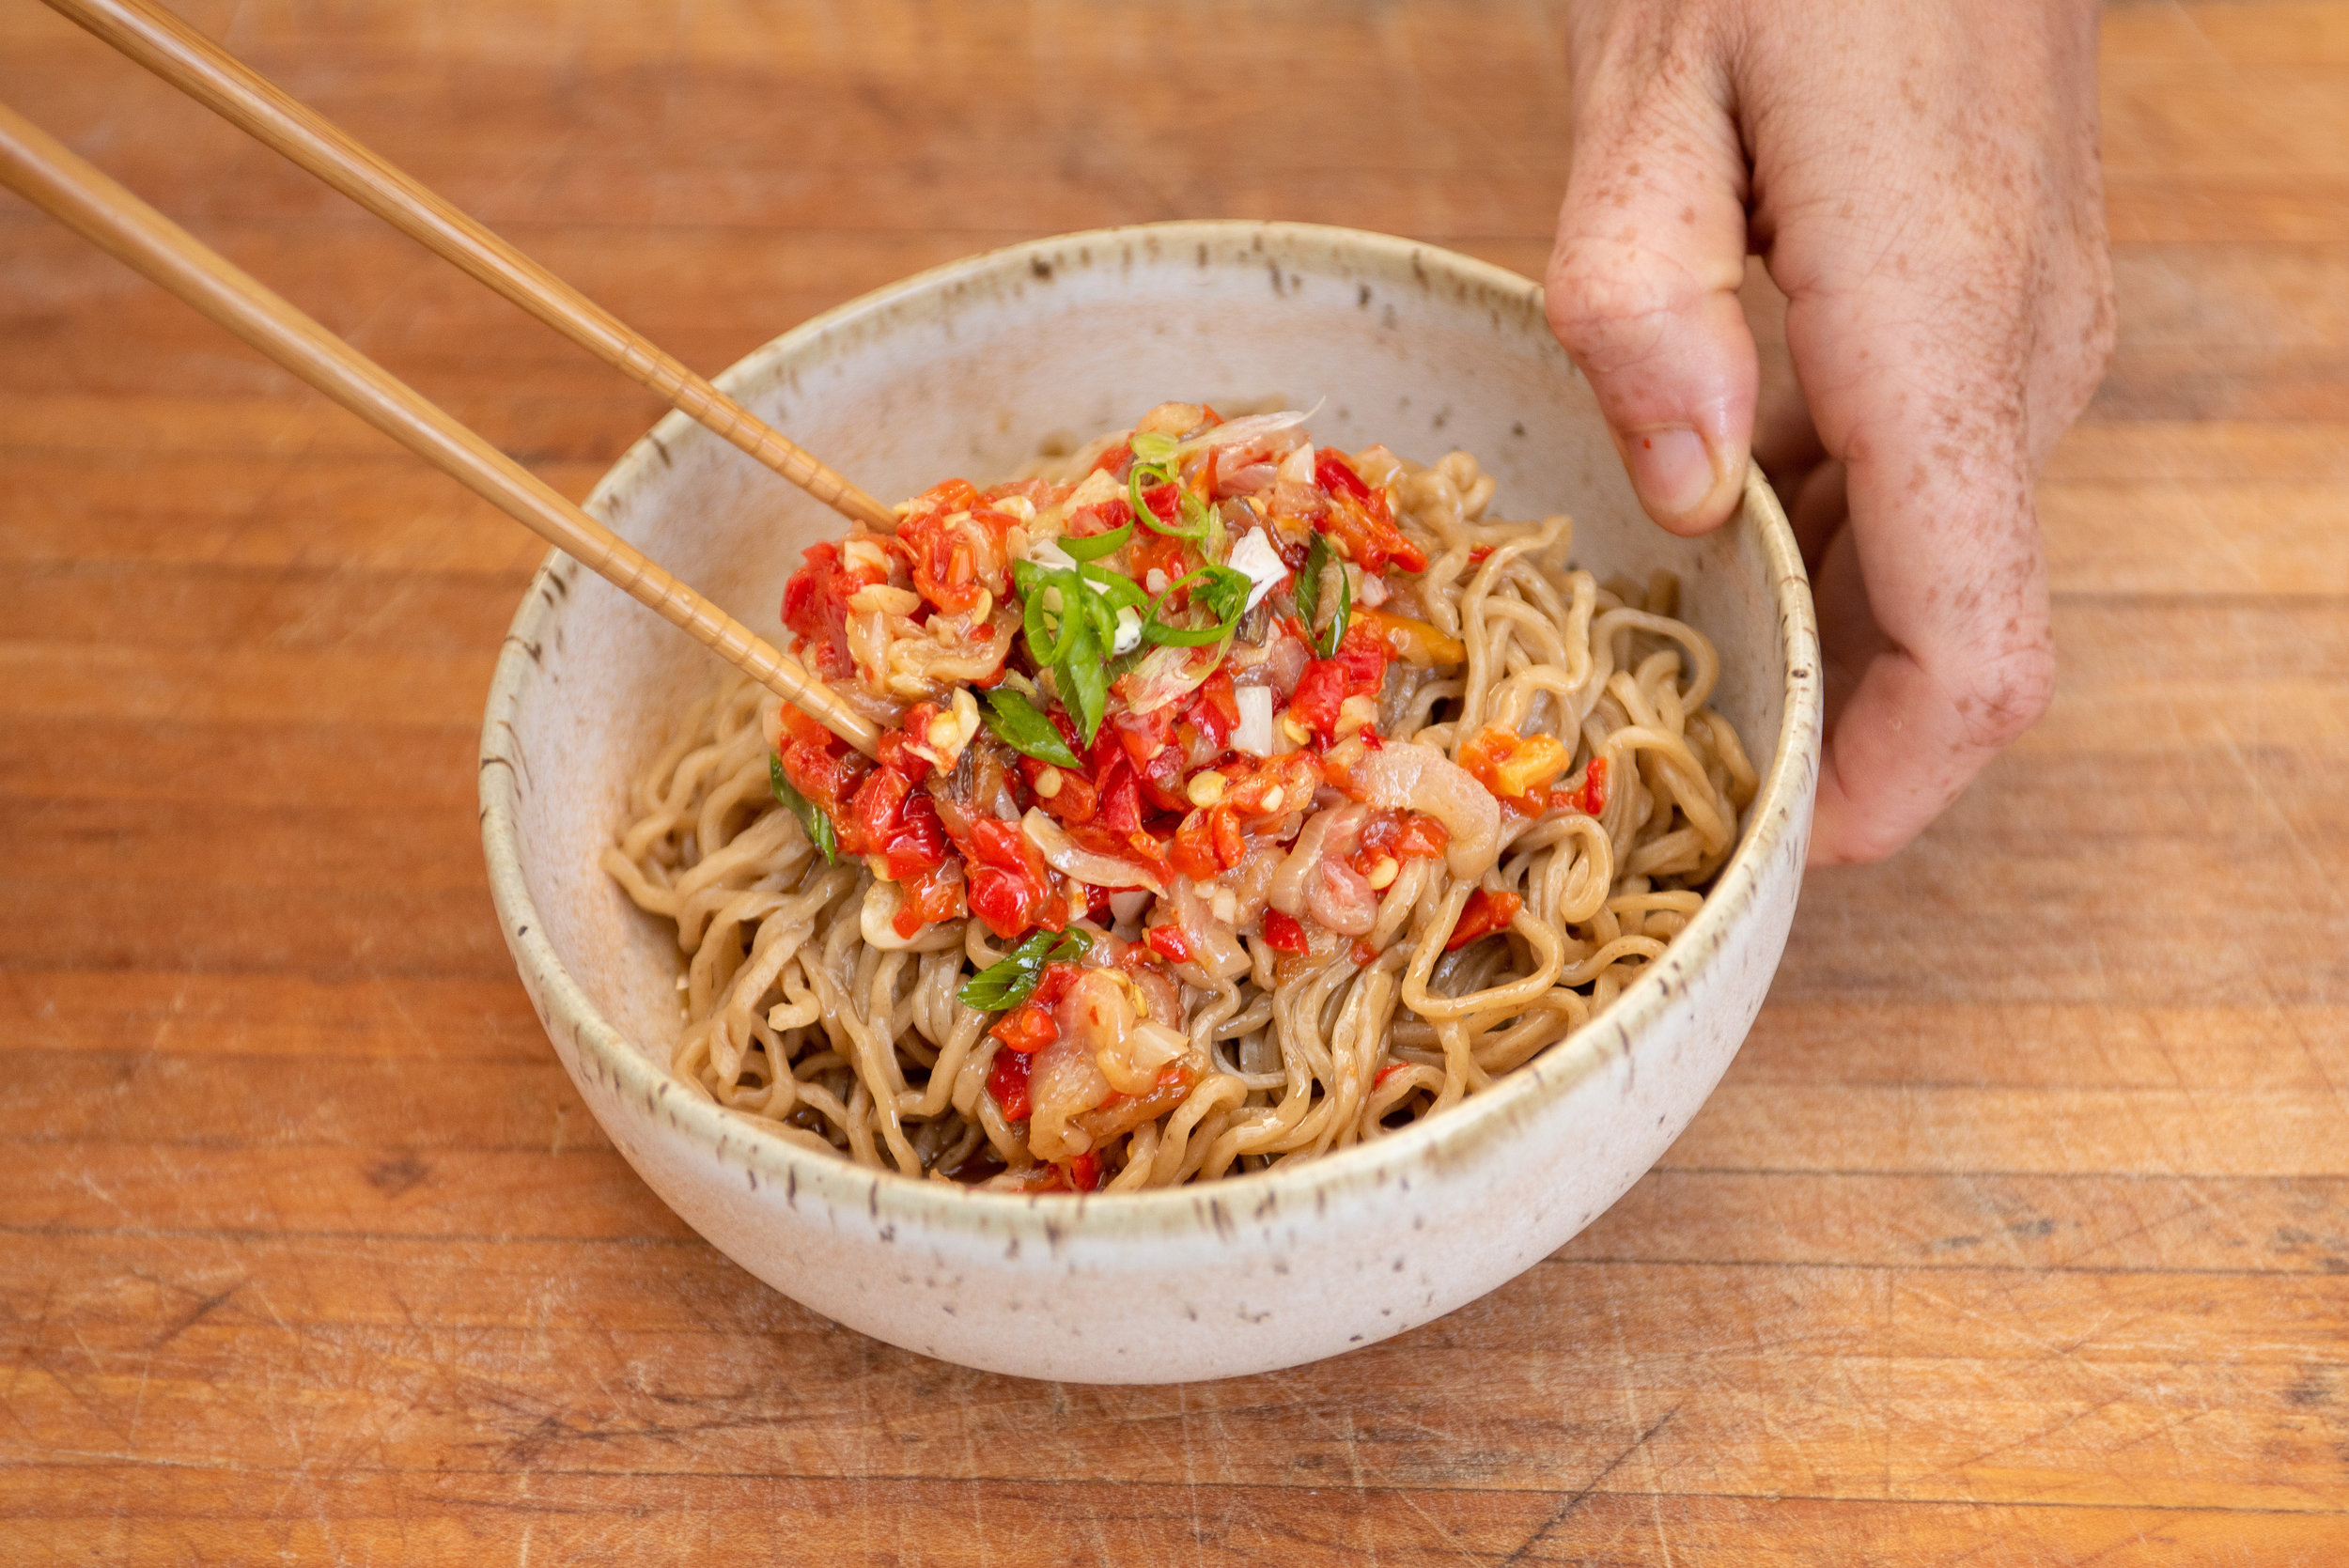 chili garlic noodles-057.jpg